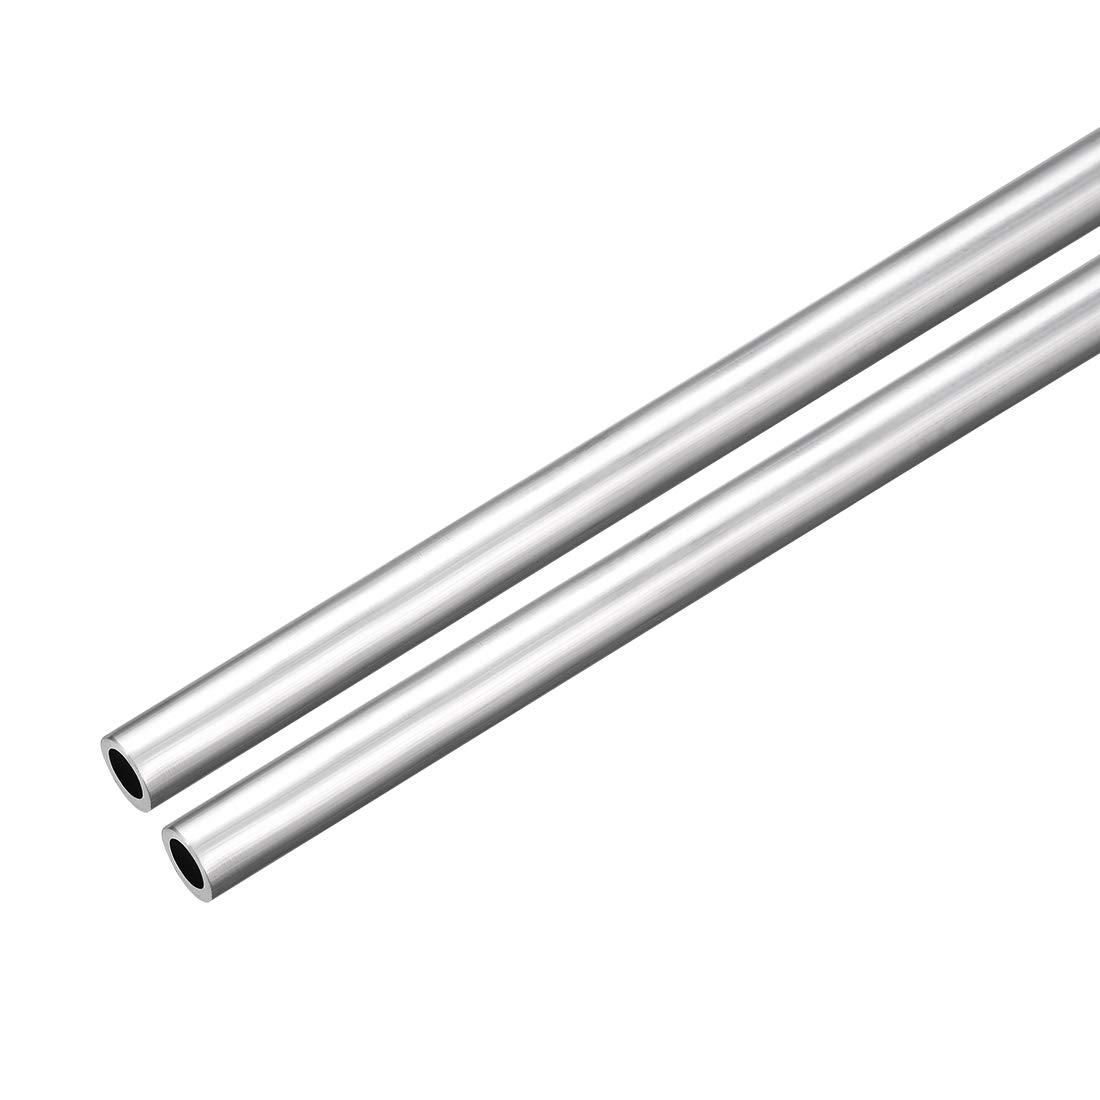 uxcell 6063 Aluminum Round Tube 300mm Length 16mm OD 5mm Inner Dia Seamless Aluminum Straight Tubing 2 Pcs